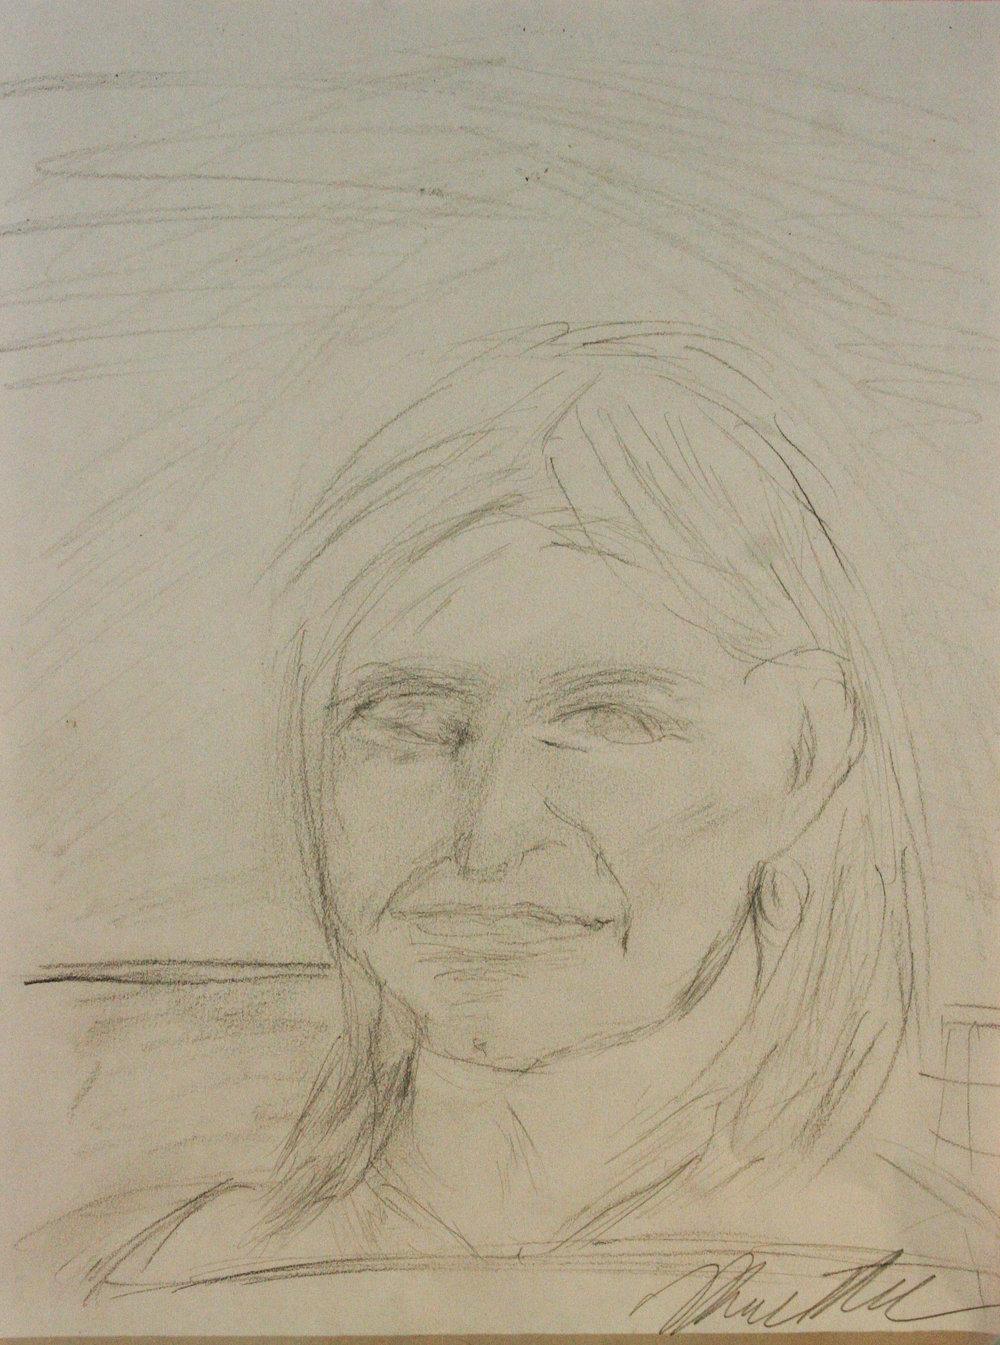 Paul Reulbach did this sketch.